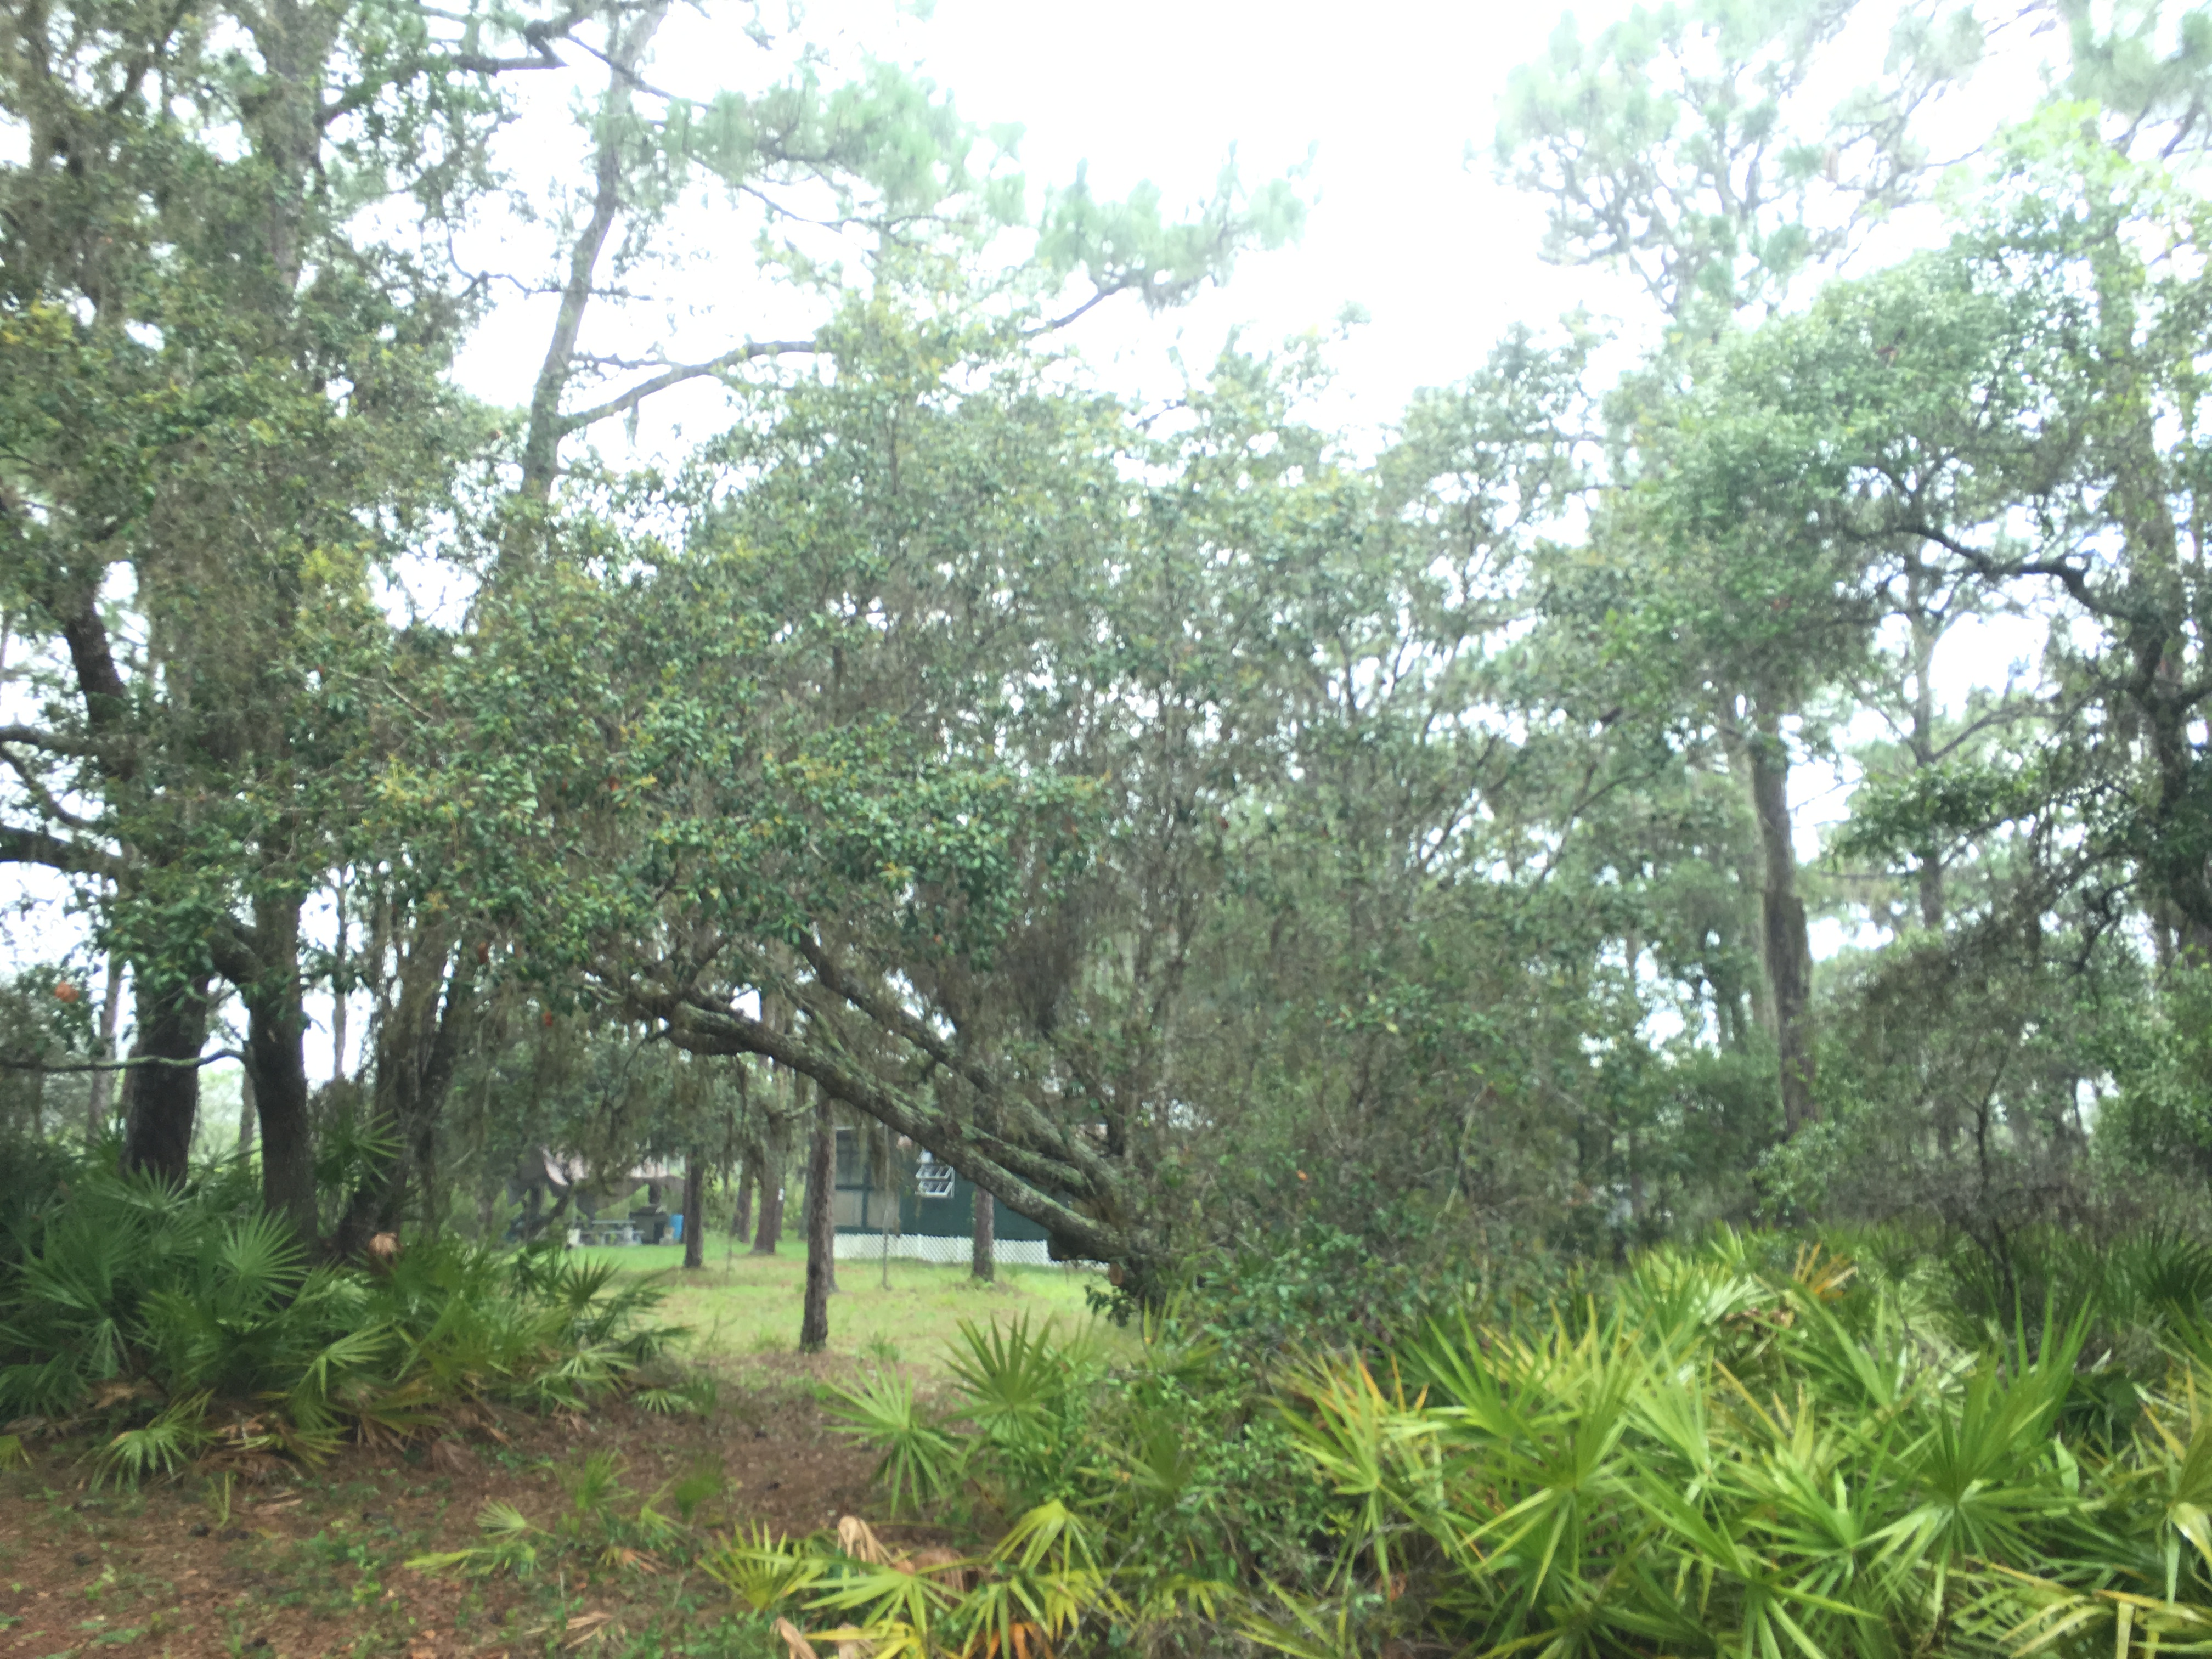 River Ranch Florida Recreational RRPOA Property Camp lot Campsite